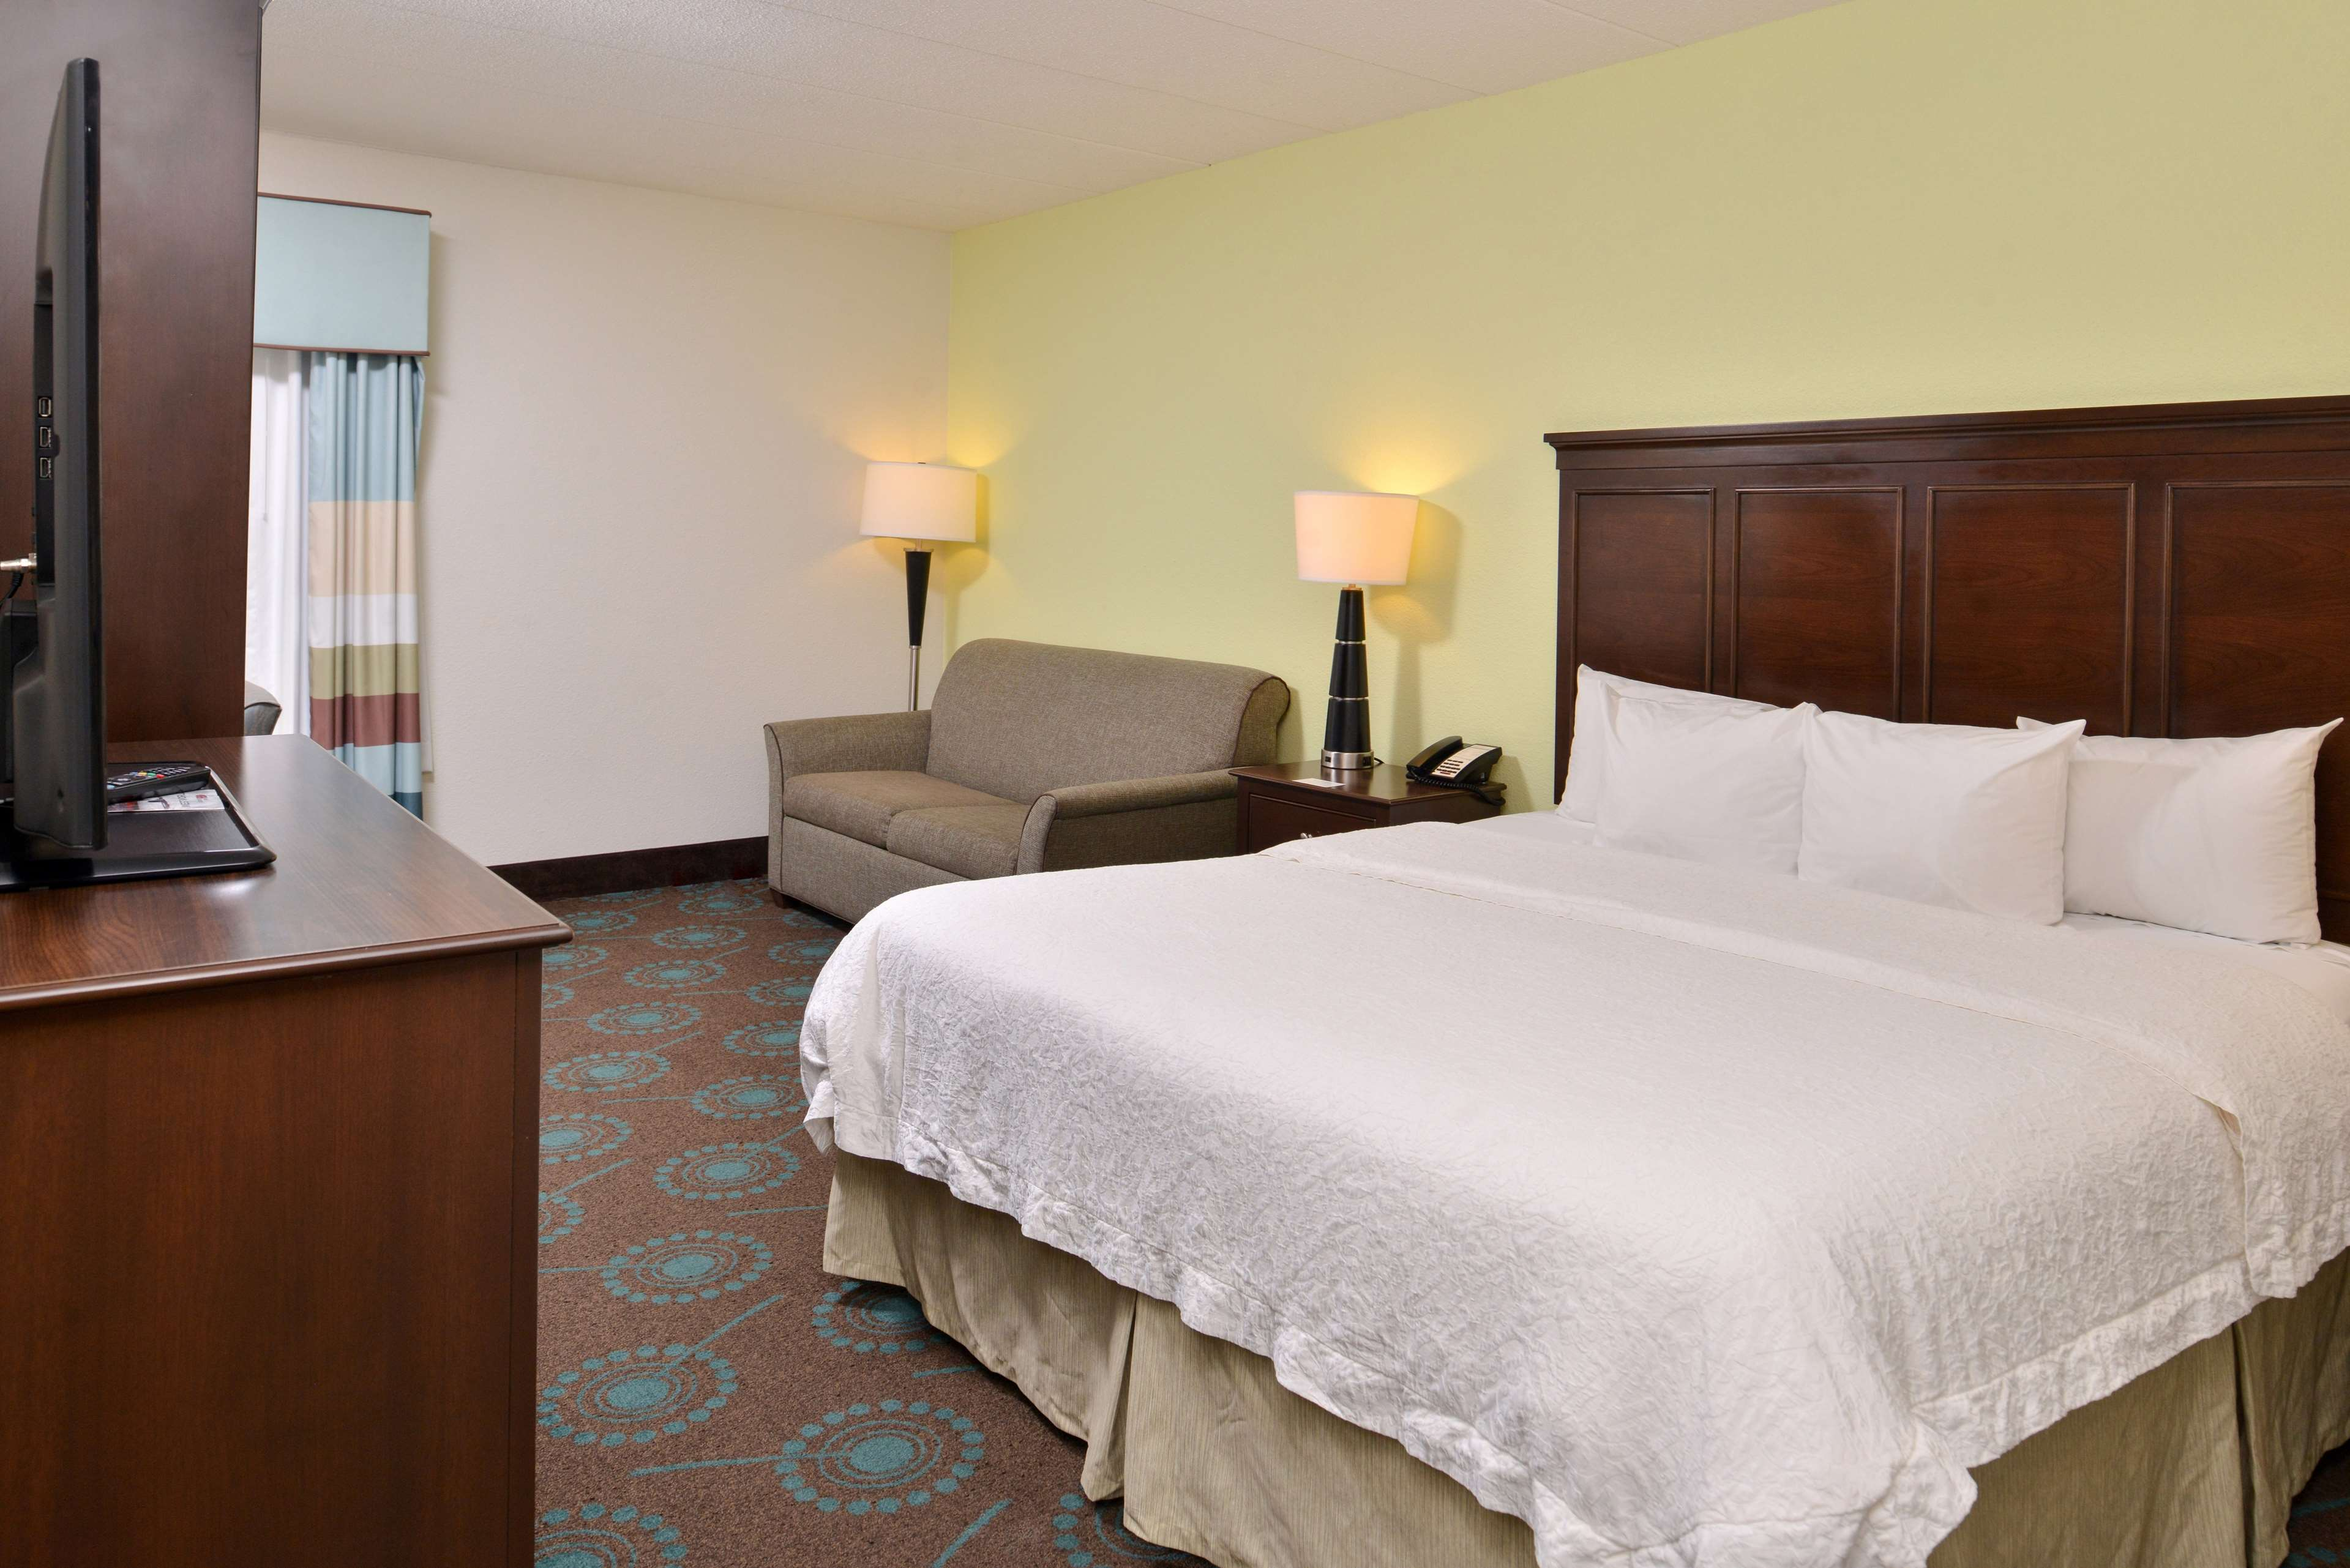 Hampton Inn & Suites Newport News (Oyster Point) image 16